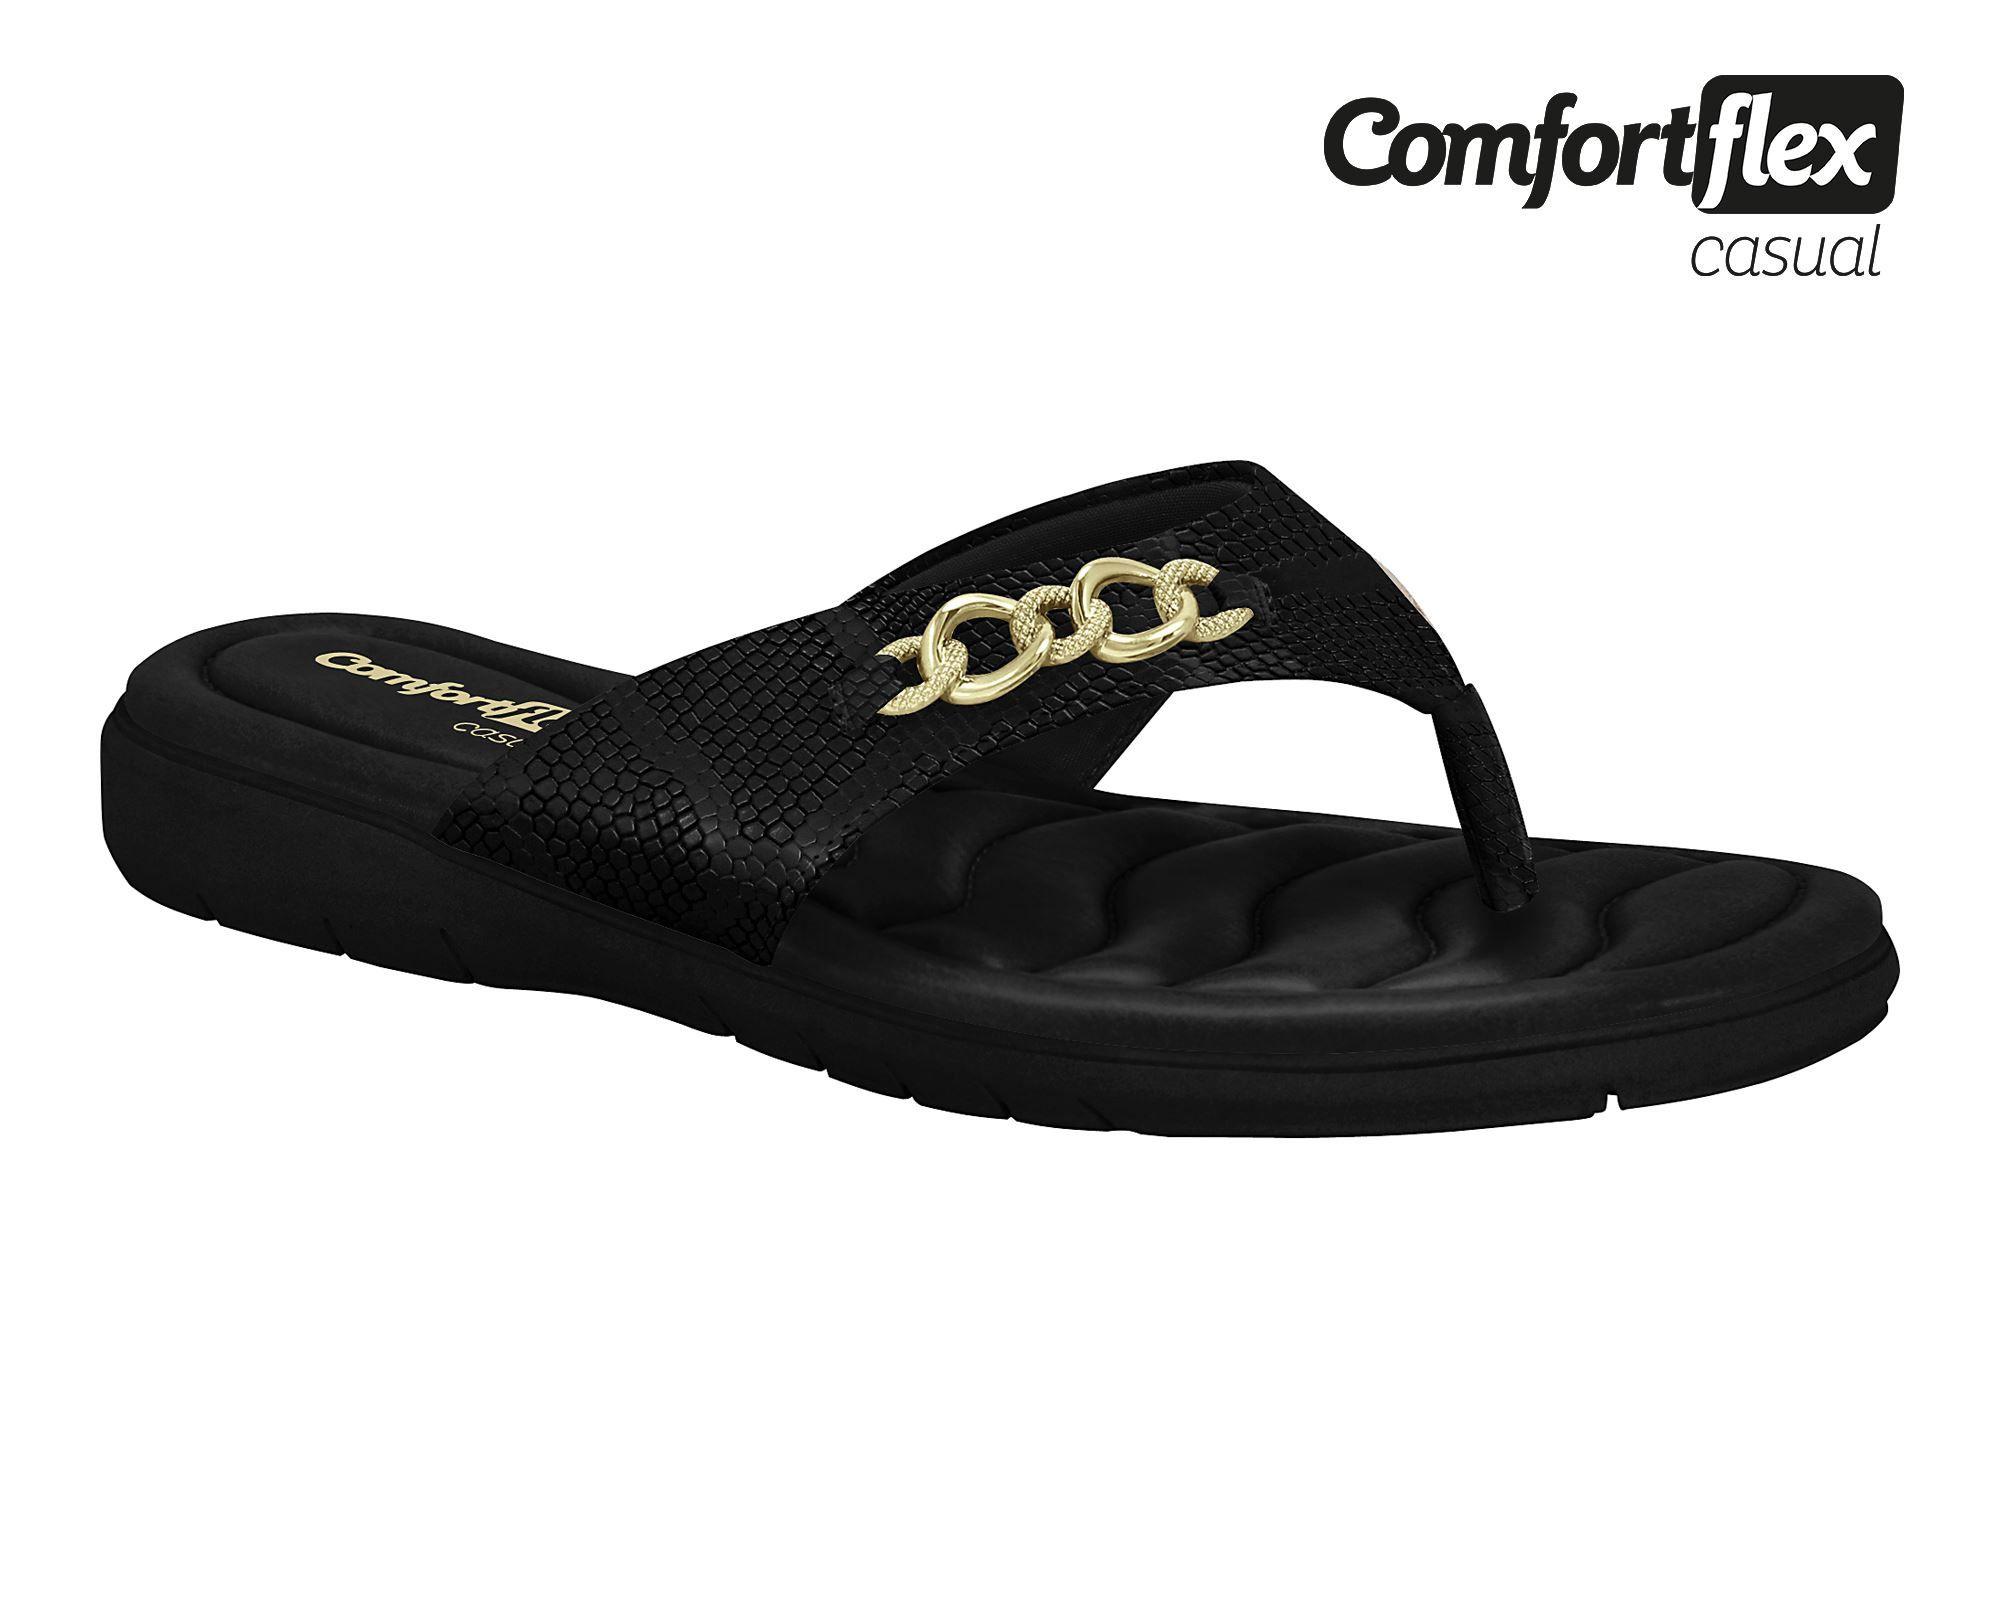 Tamanco Chinelo Comfortflex Casual 1980406 Feminino Conforto